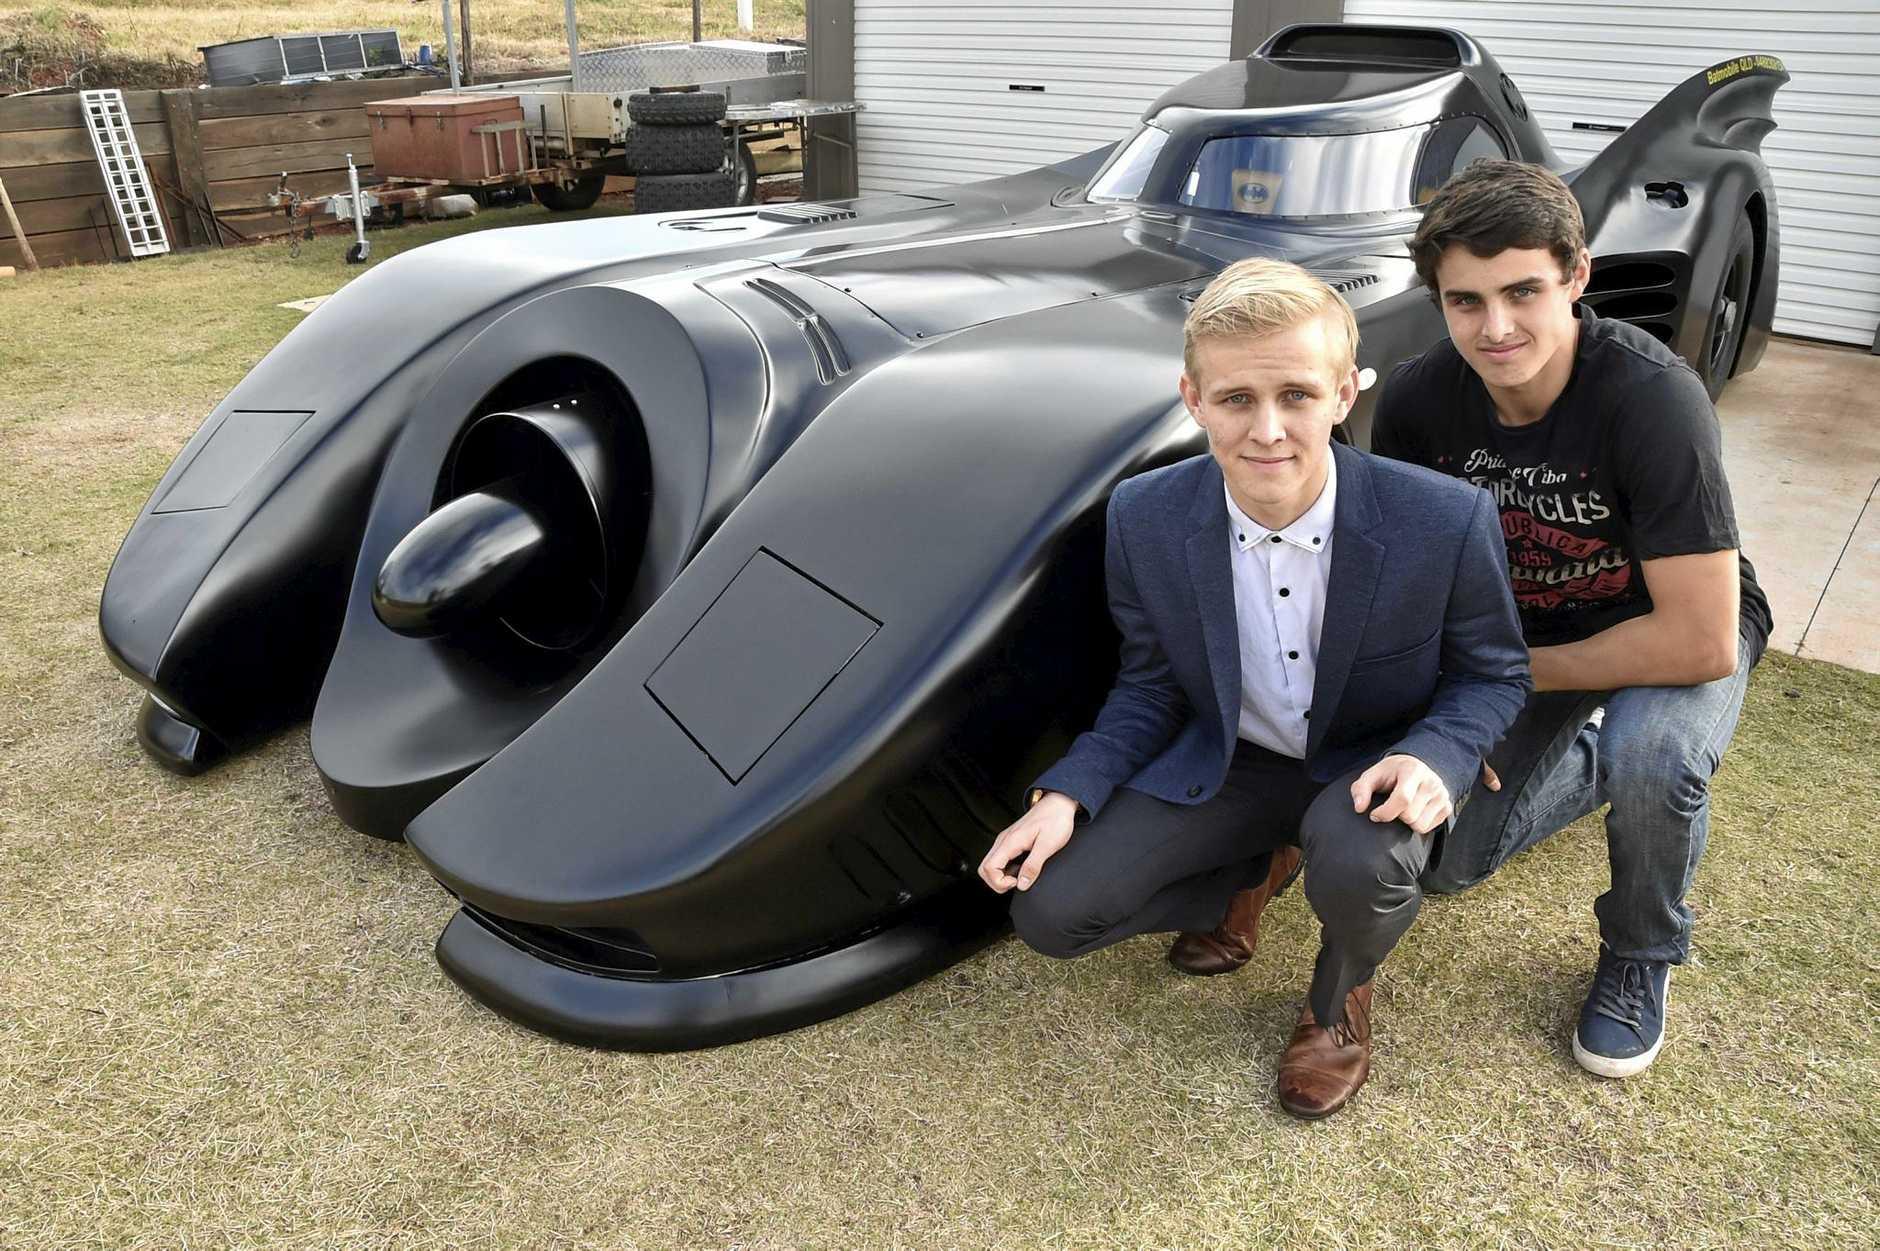 PAYING RESPECT: Batman fans Shaun (left) and Stuart Blackburn honour actor Adam West's famed role with their Batmobile.